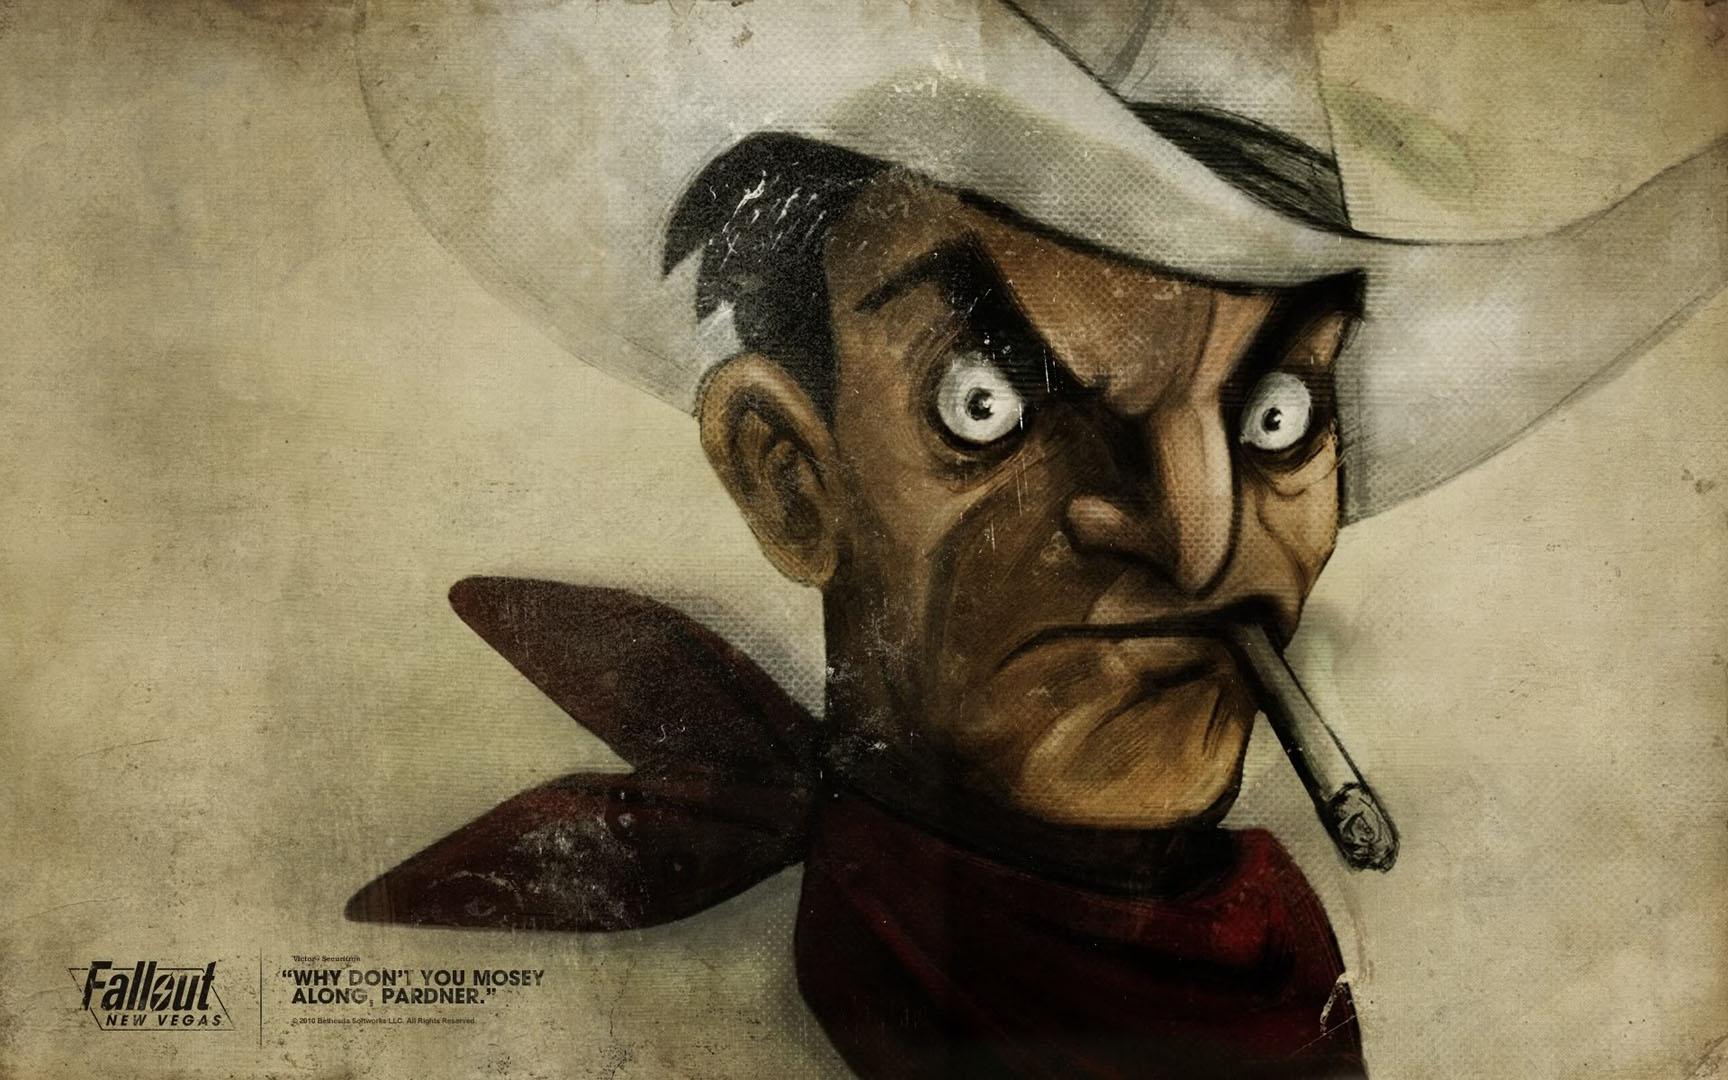 Cowboy With Cigarette